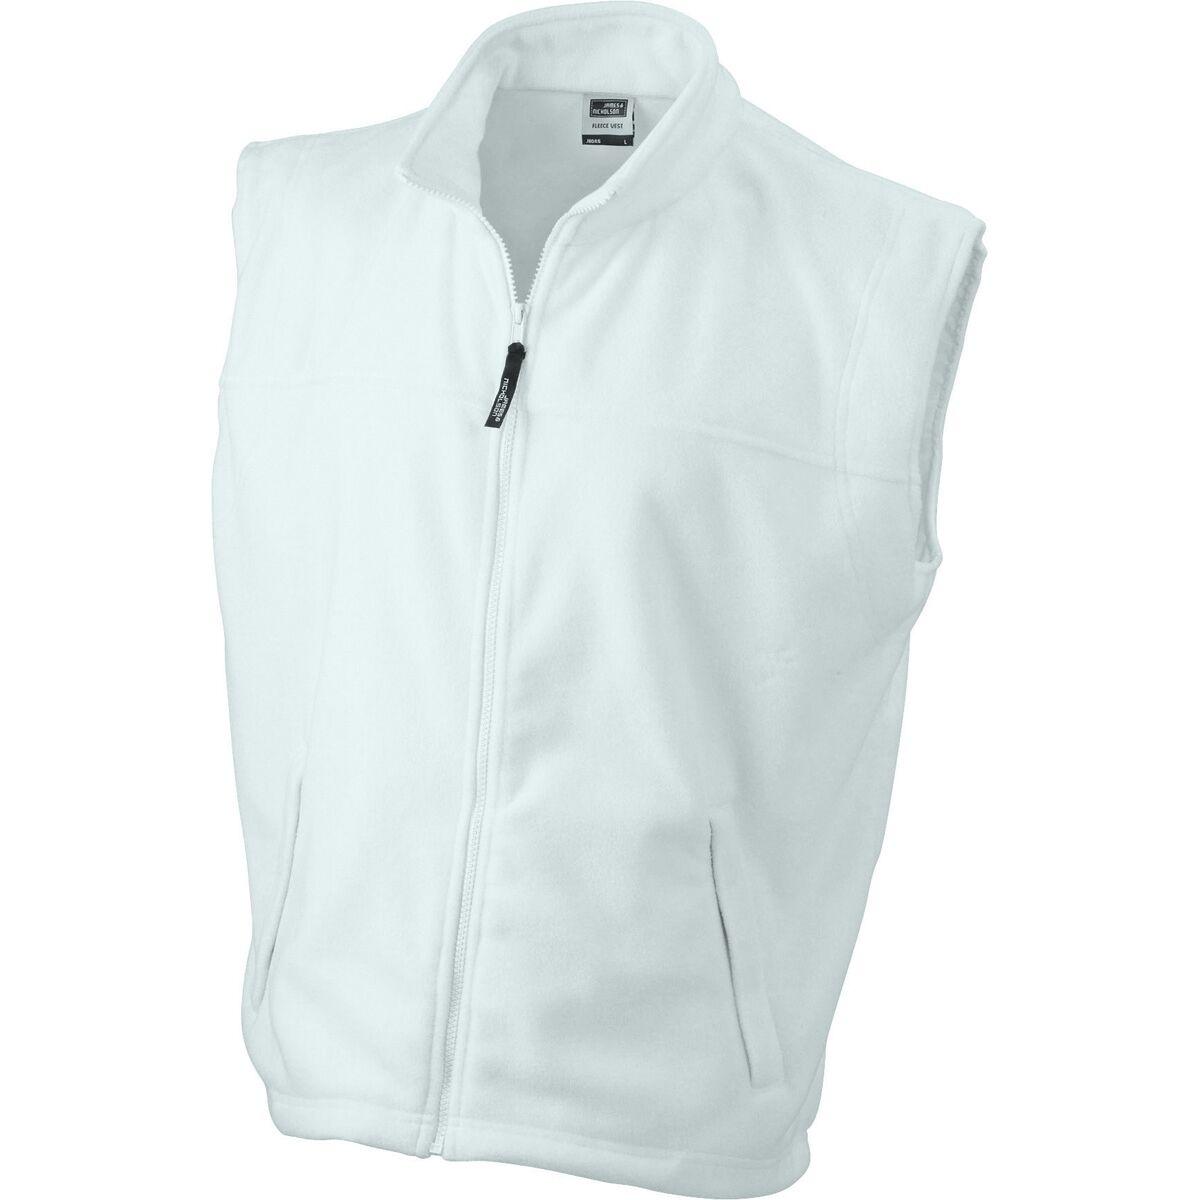 Gilet sans manches bodywarmer polaire homme - JN045 - blanc